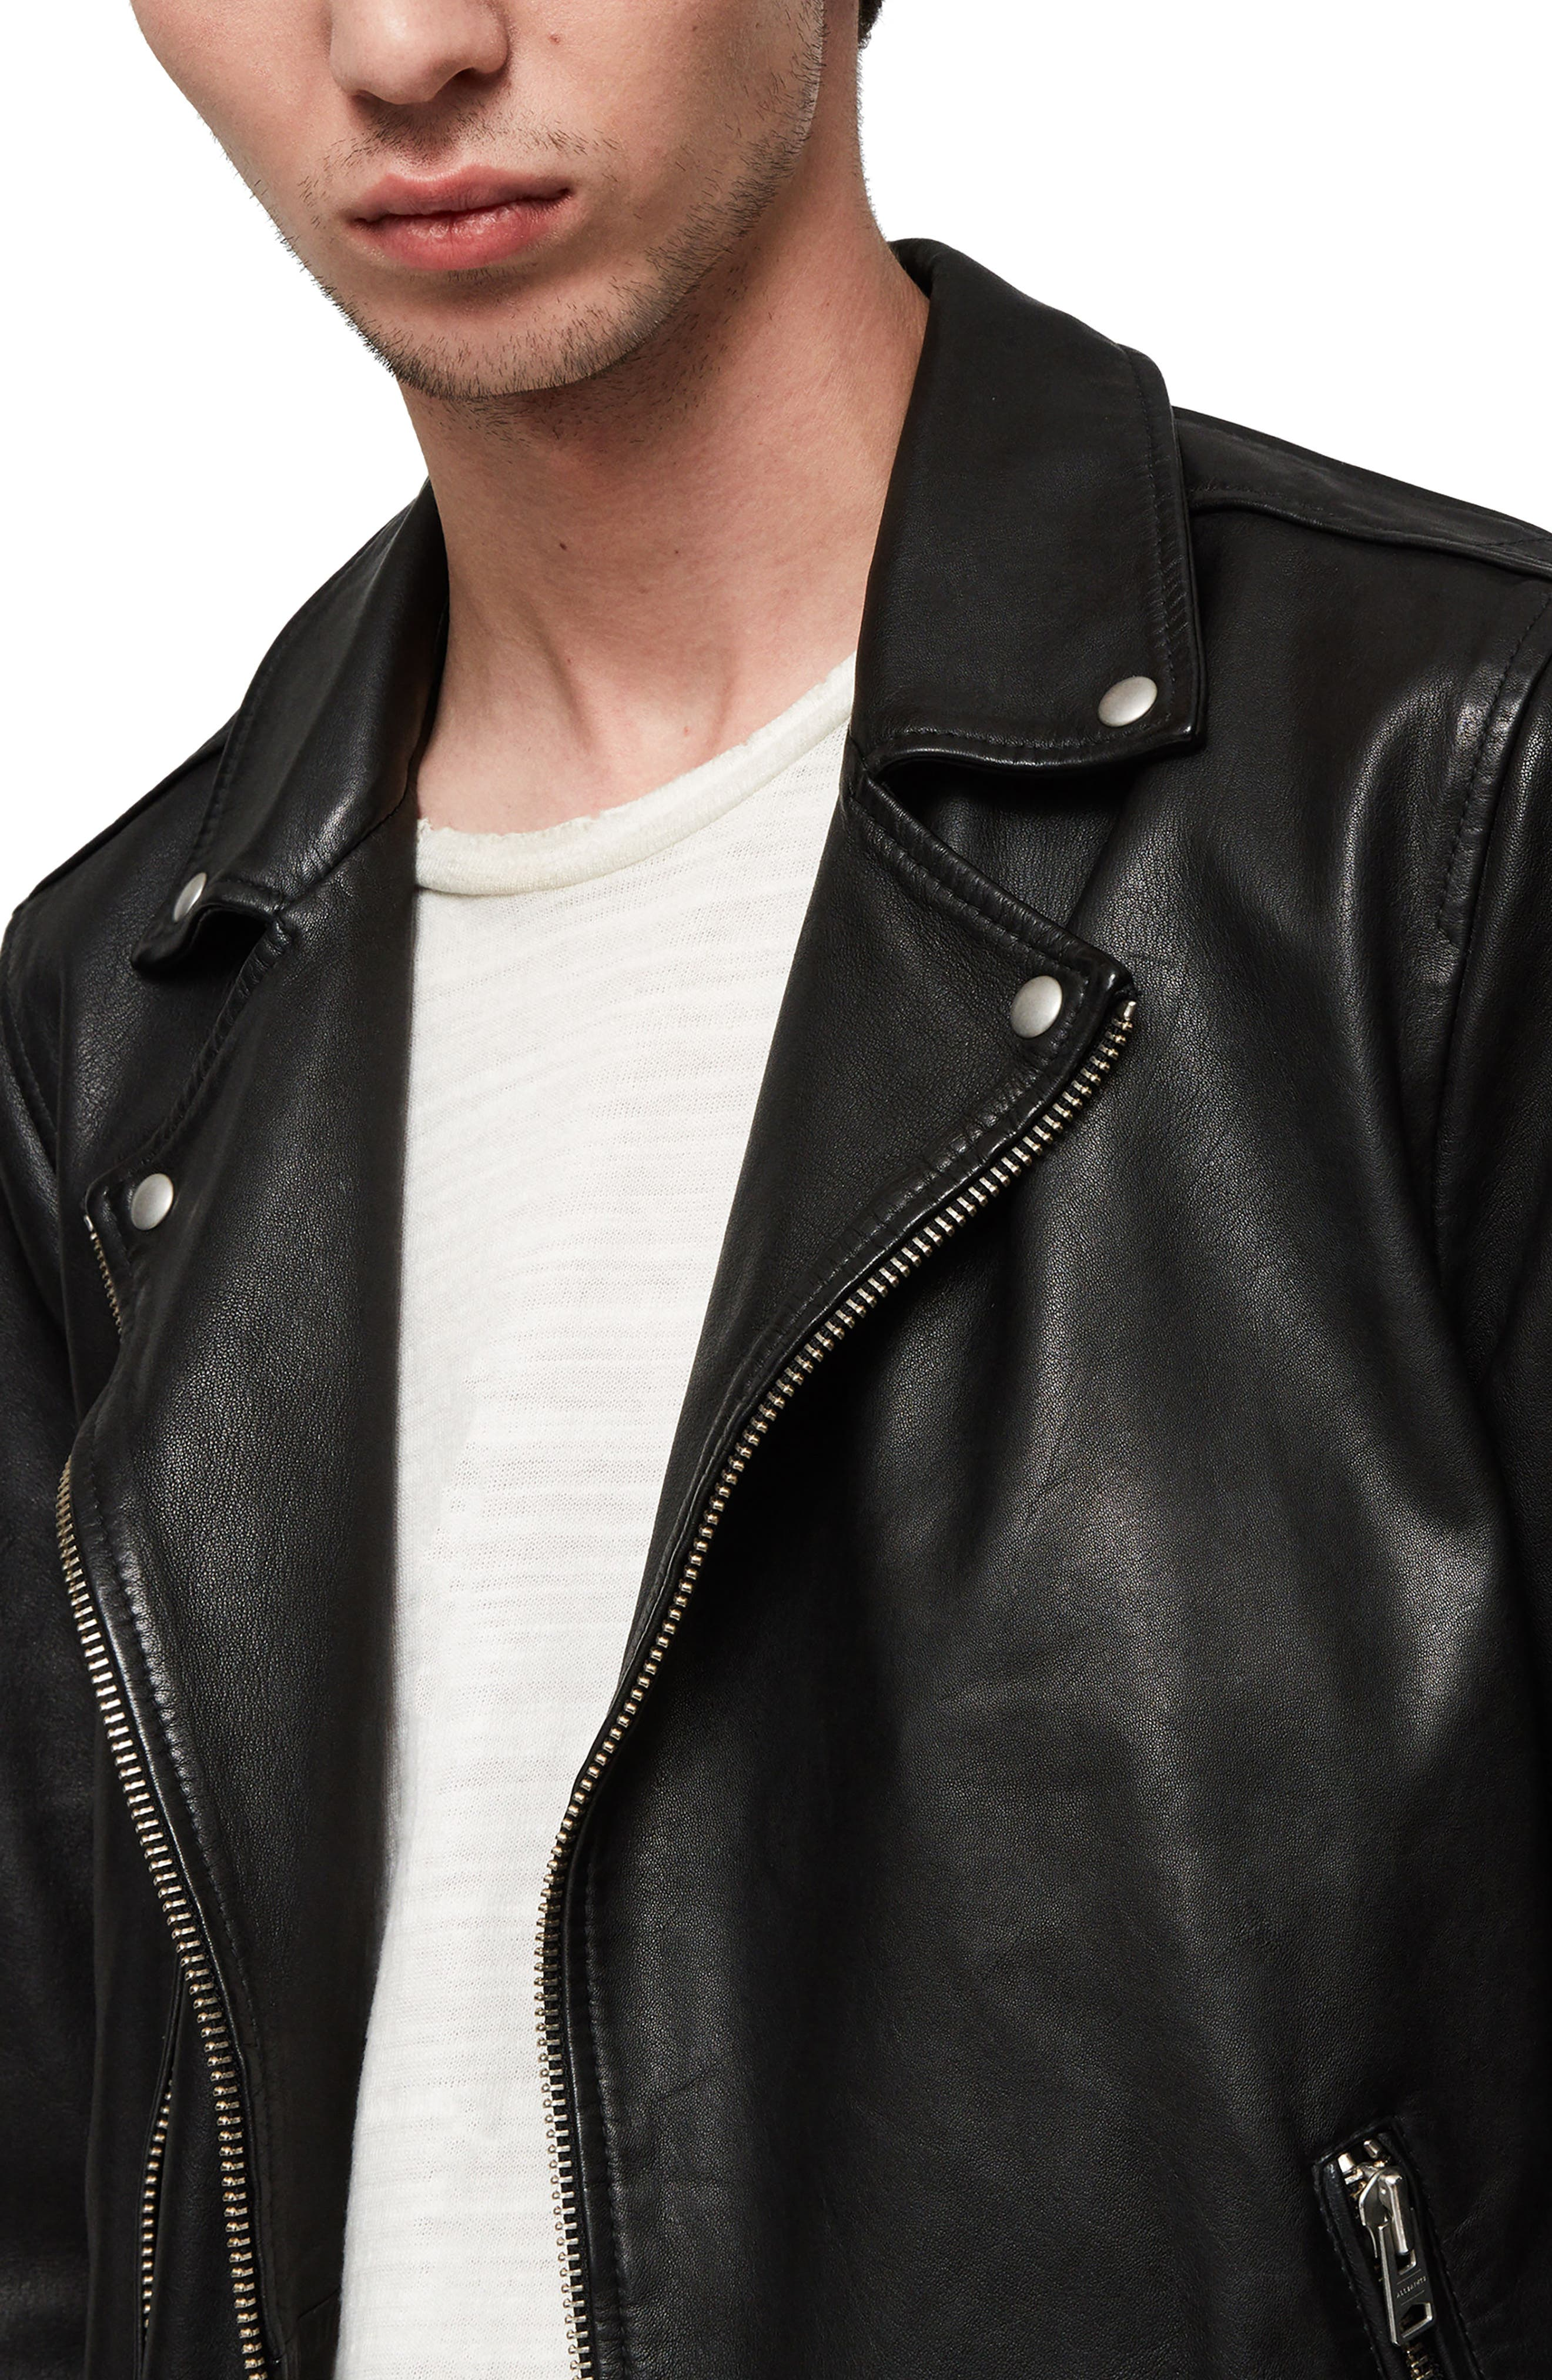 Wick Slim Fit Leather Biker Jacket,                             Alternate thumbnail 3, color,                             BLACK